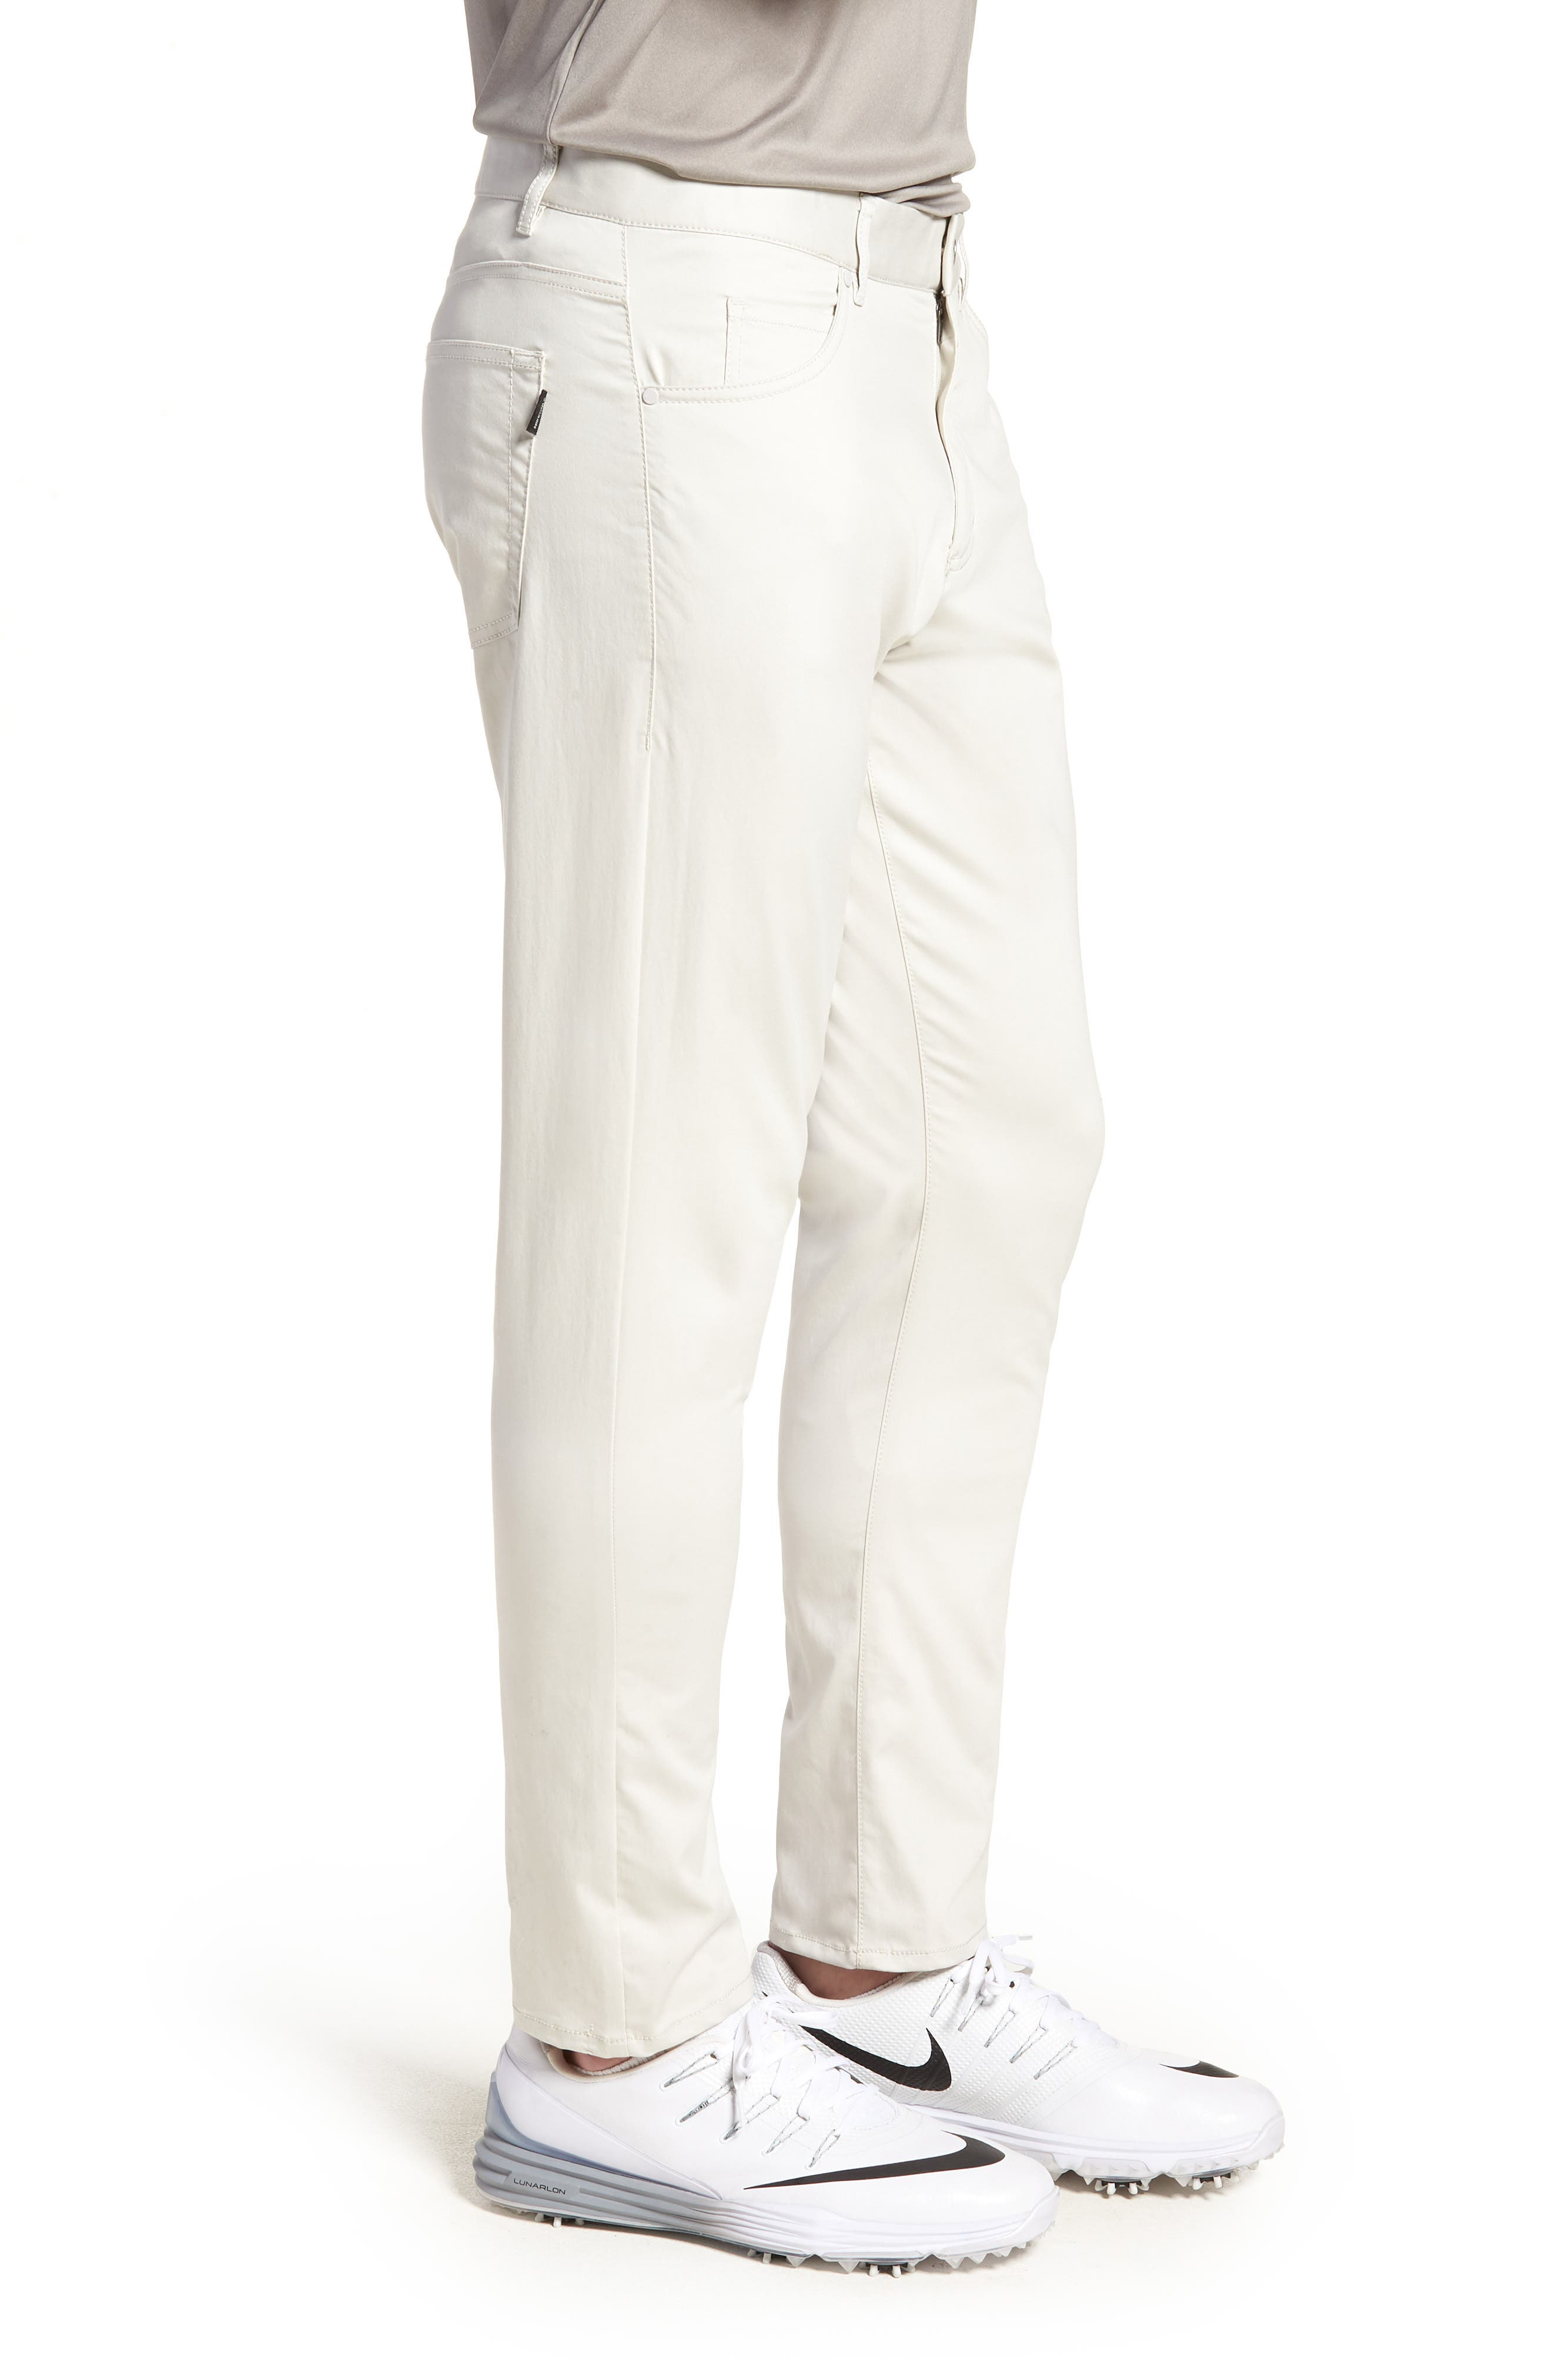 Dry Flex Slim Fit Golf Pants,                             Alternate thumbnail 3, color,                             LIGHT BONE/ WHITE